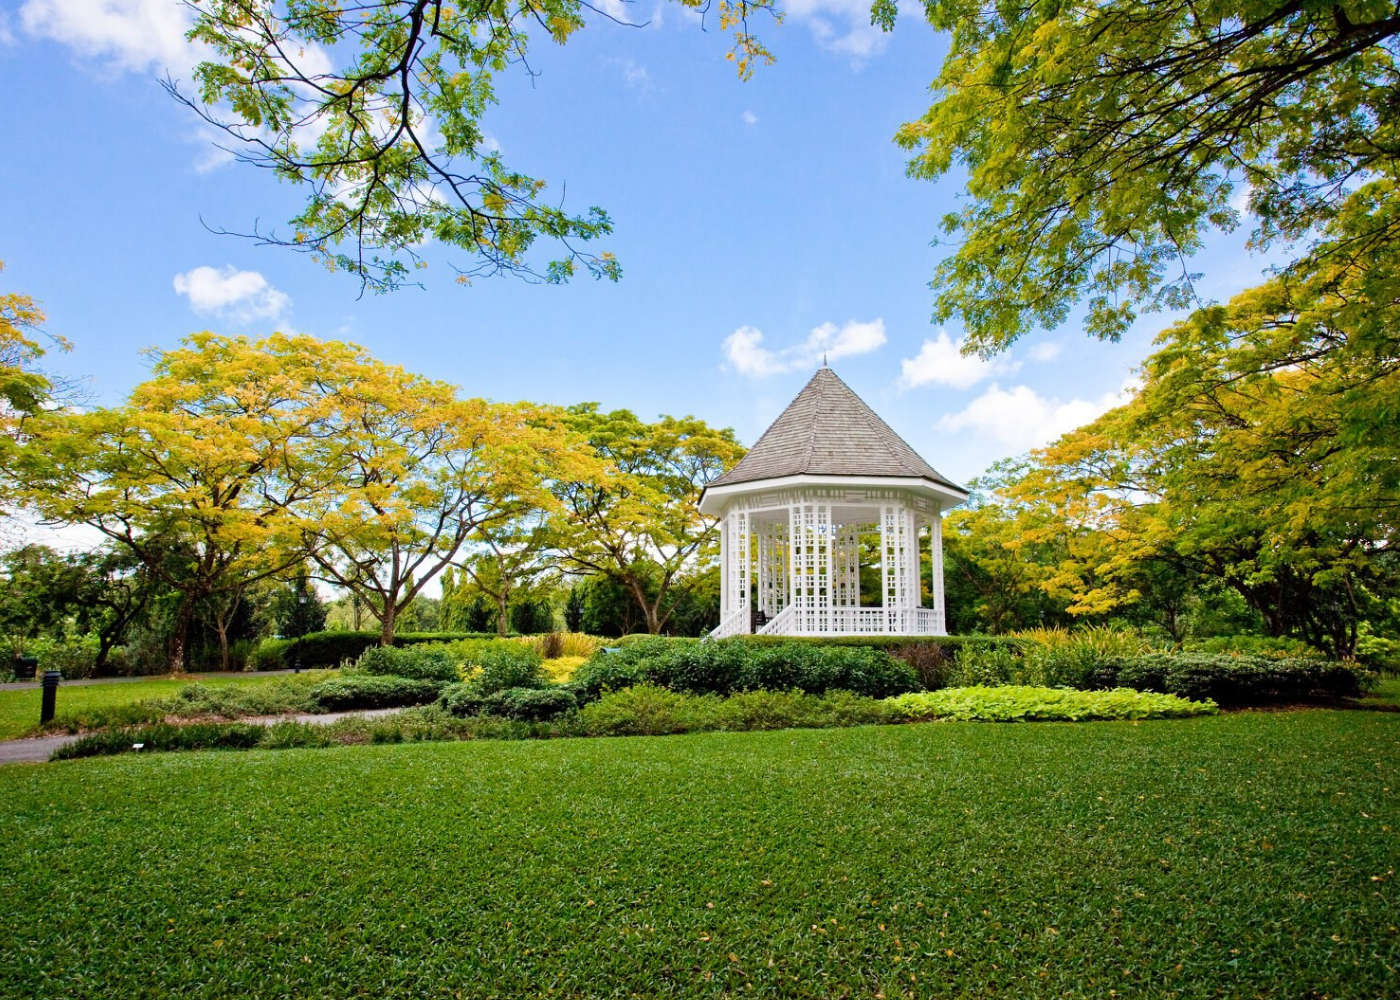 Singapore Botanic Gardens | romantic spots in Singapore